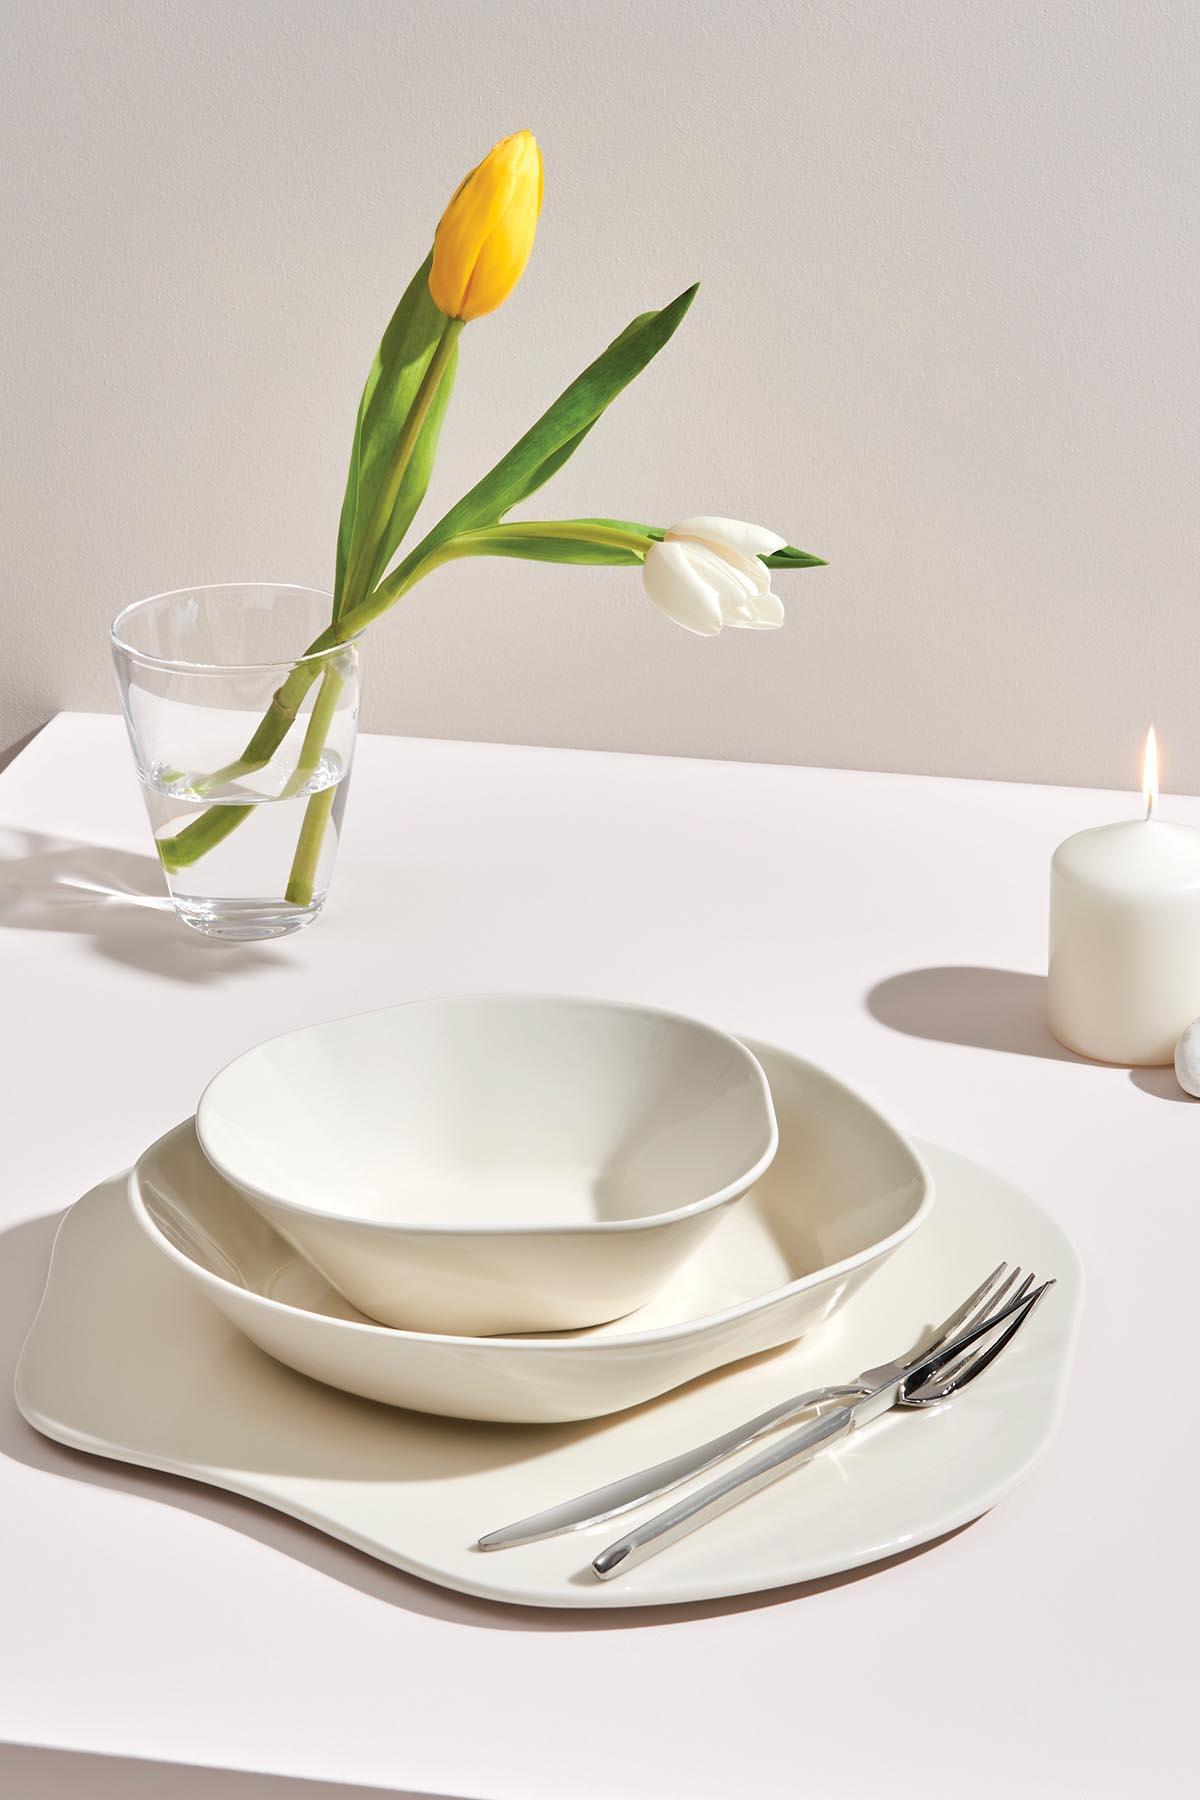 Kütahya Porselen Skallop 2′li 18 cm Pasta Seti Krem